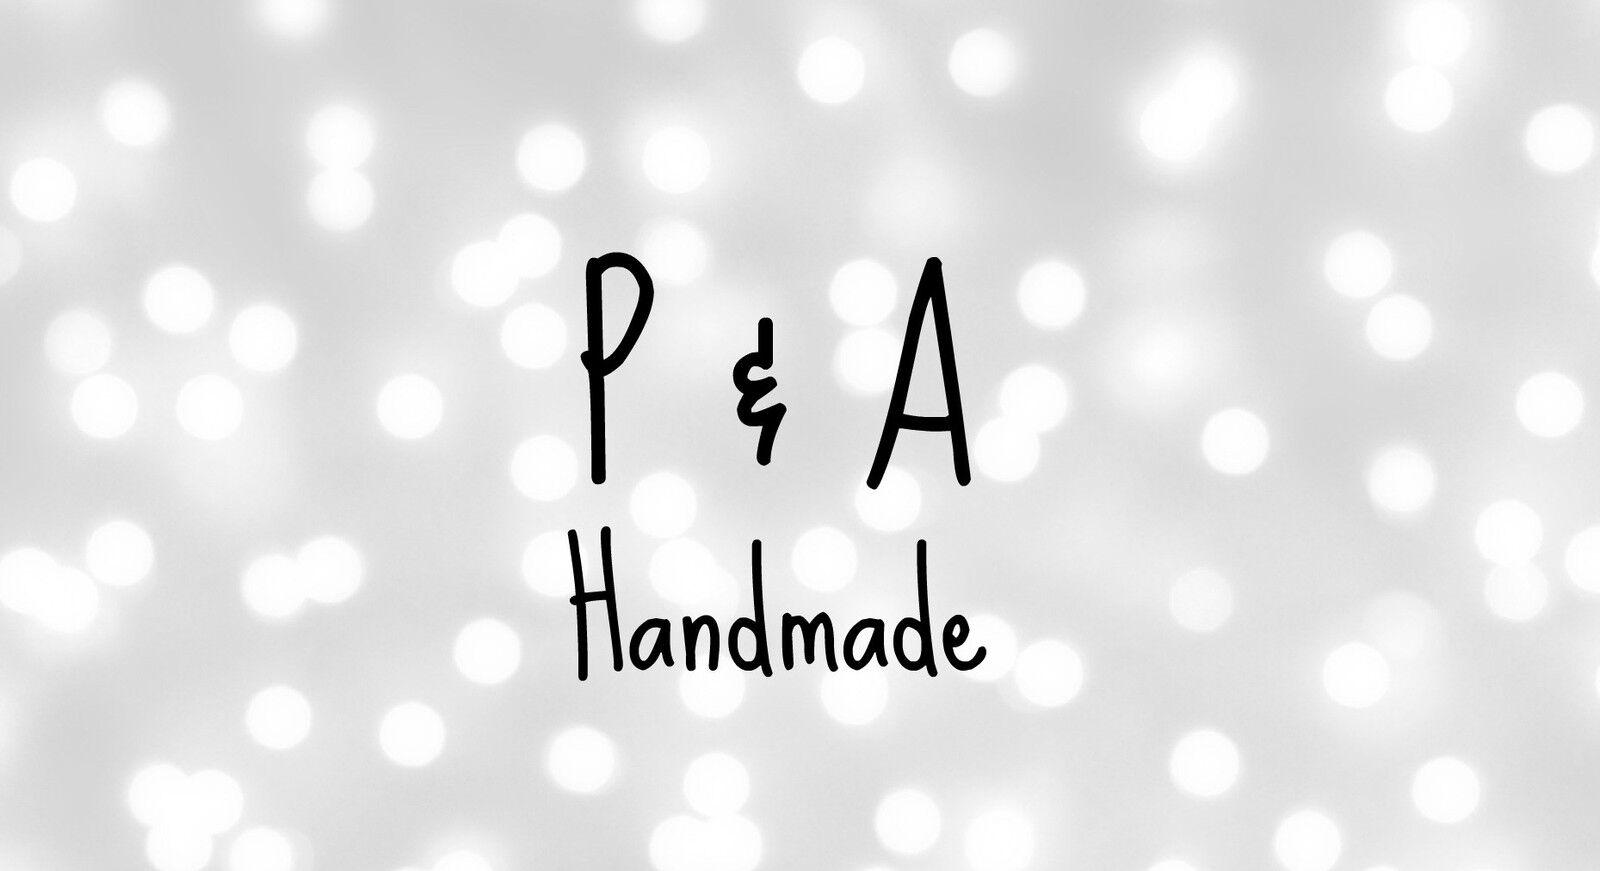 kidworkbook/P&A Handmade